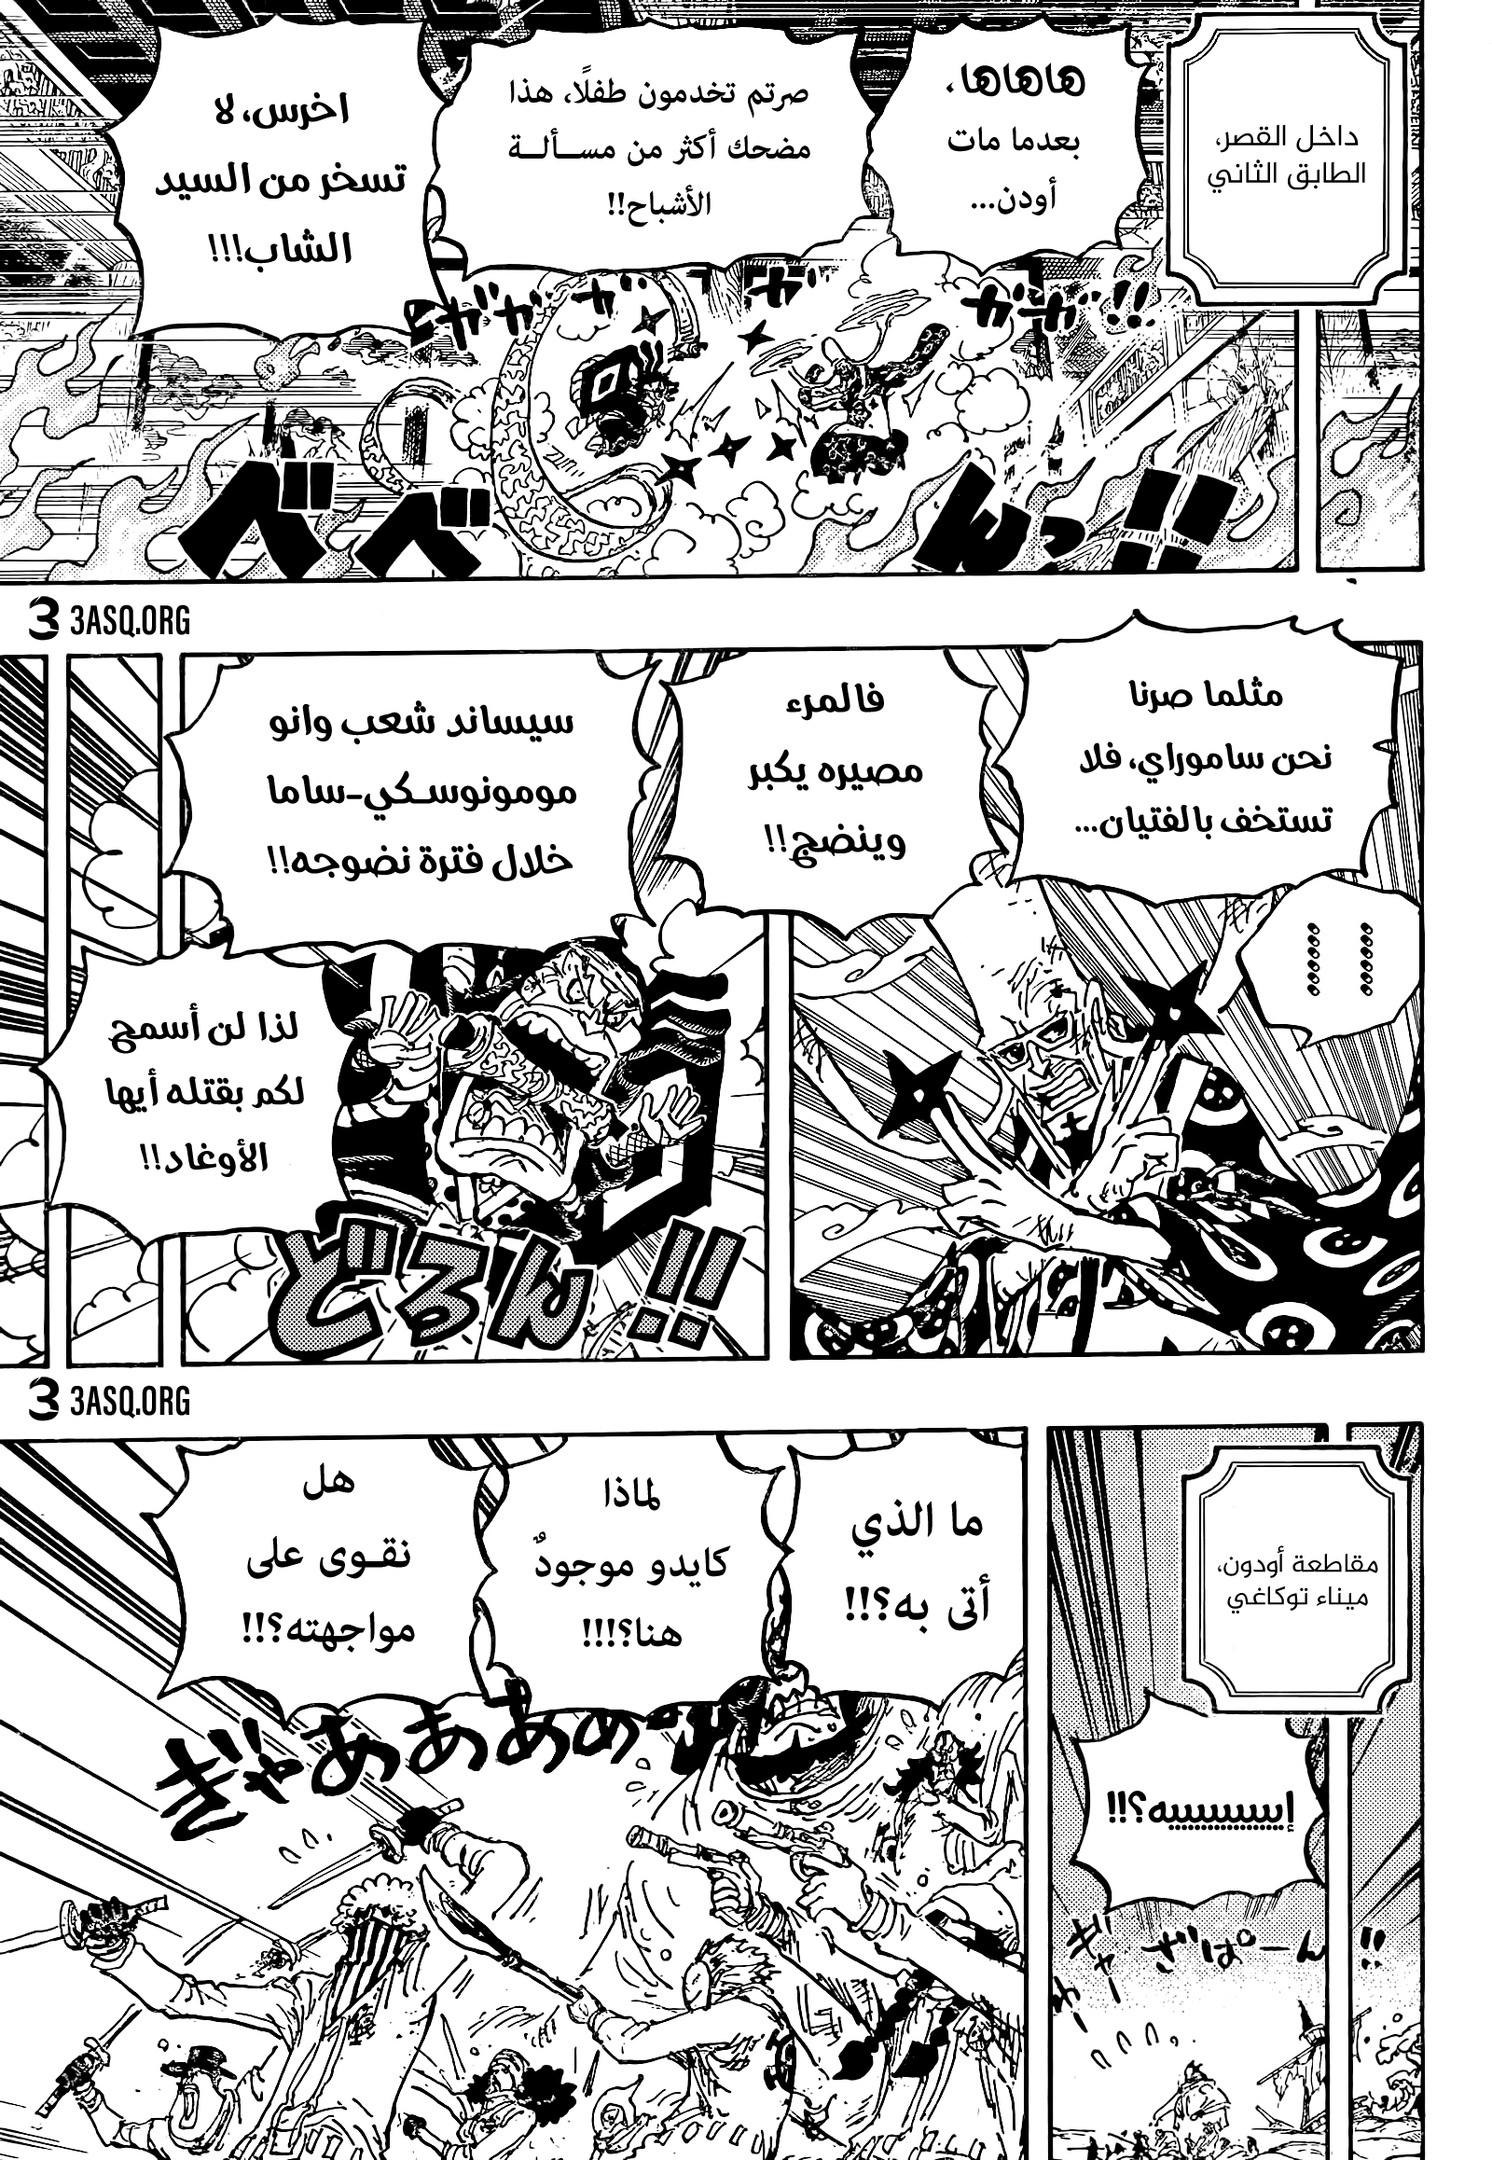 One Piece Arab 1023, image №16